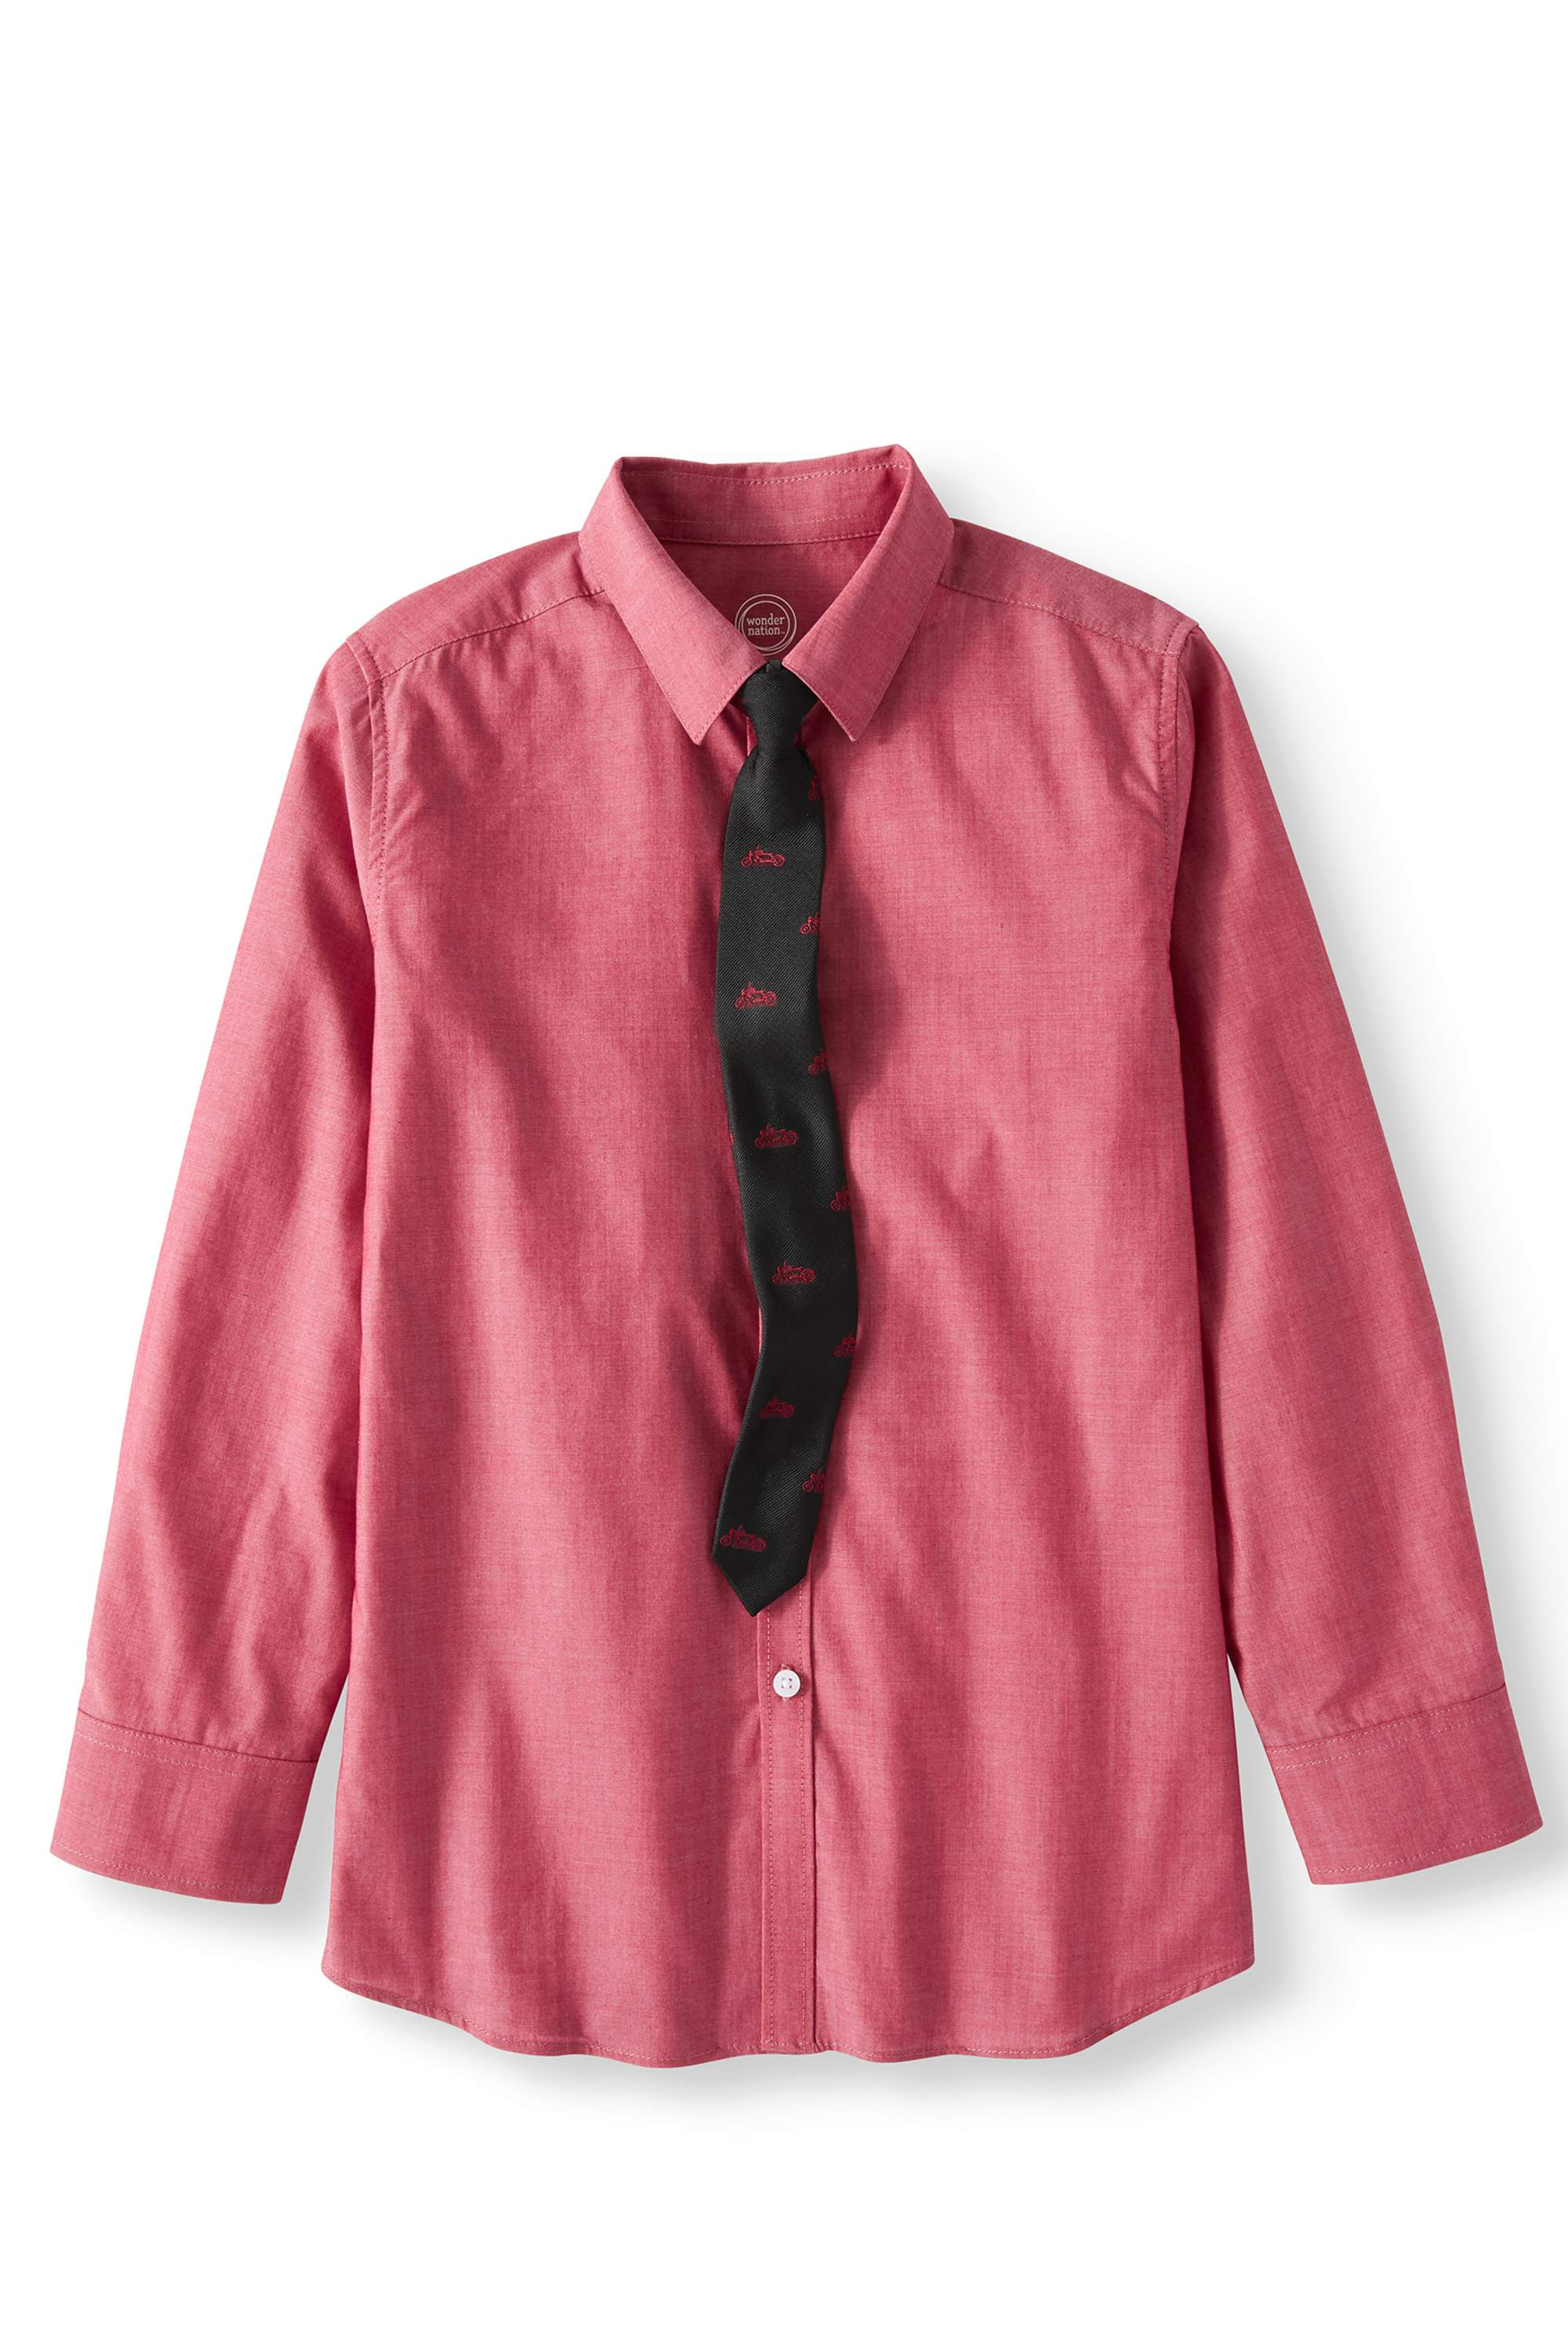 Wonder Nation Boy's Iridescent Yarn Dye Long Sleeve Dress Shirt and Tie, 2-Piece Set